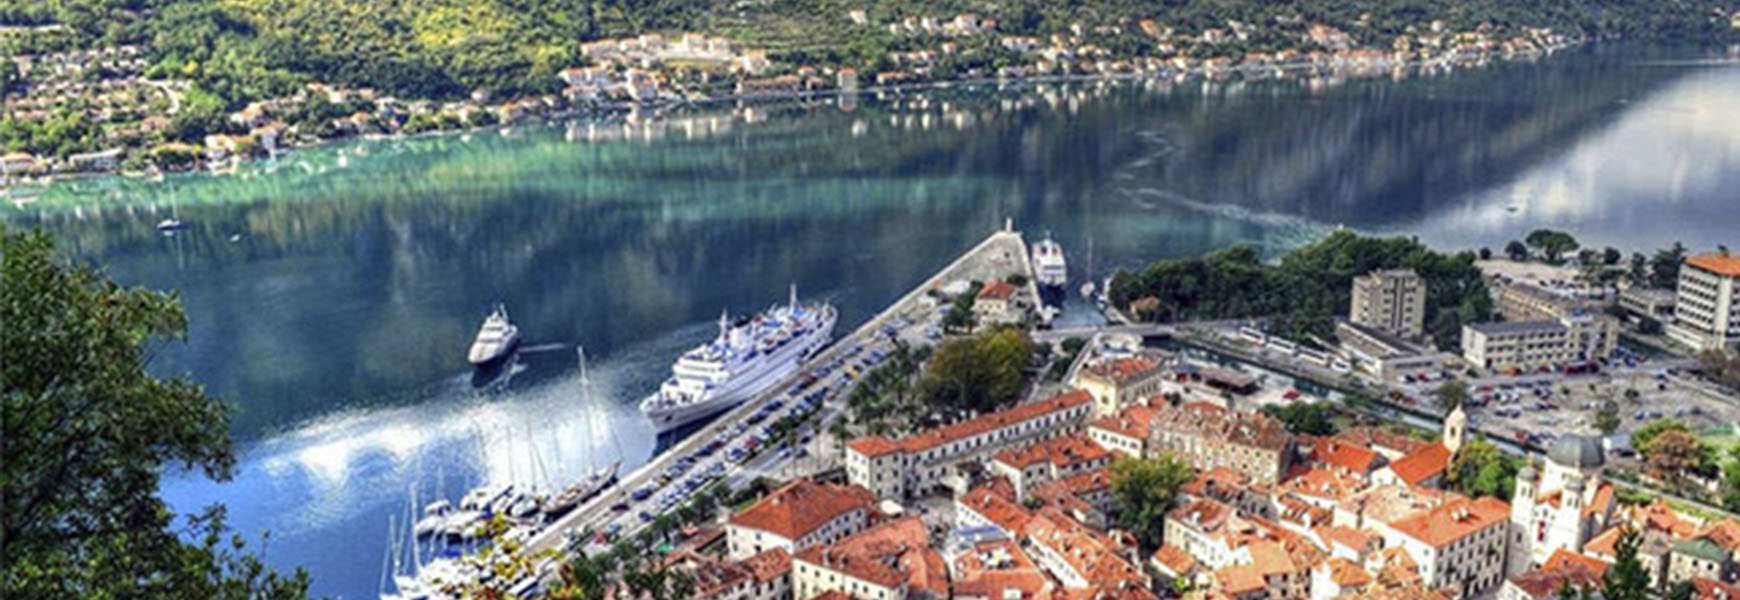 Montenegro: Where mountains meet history